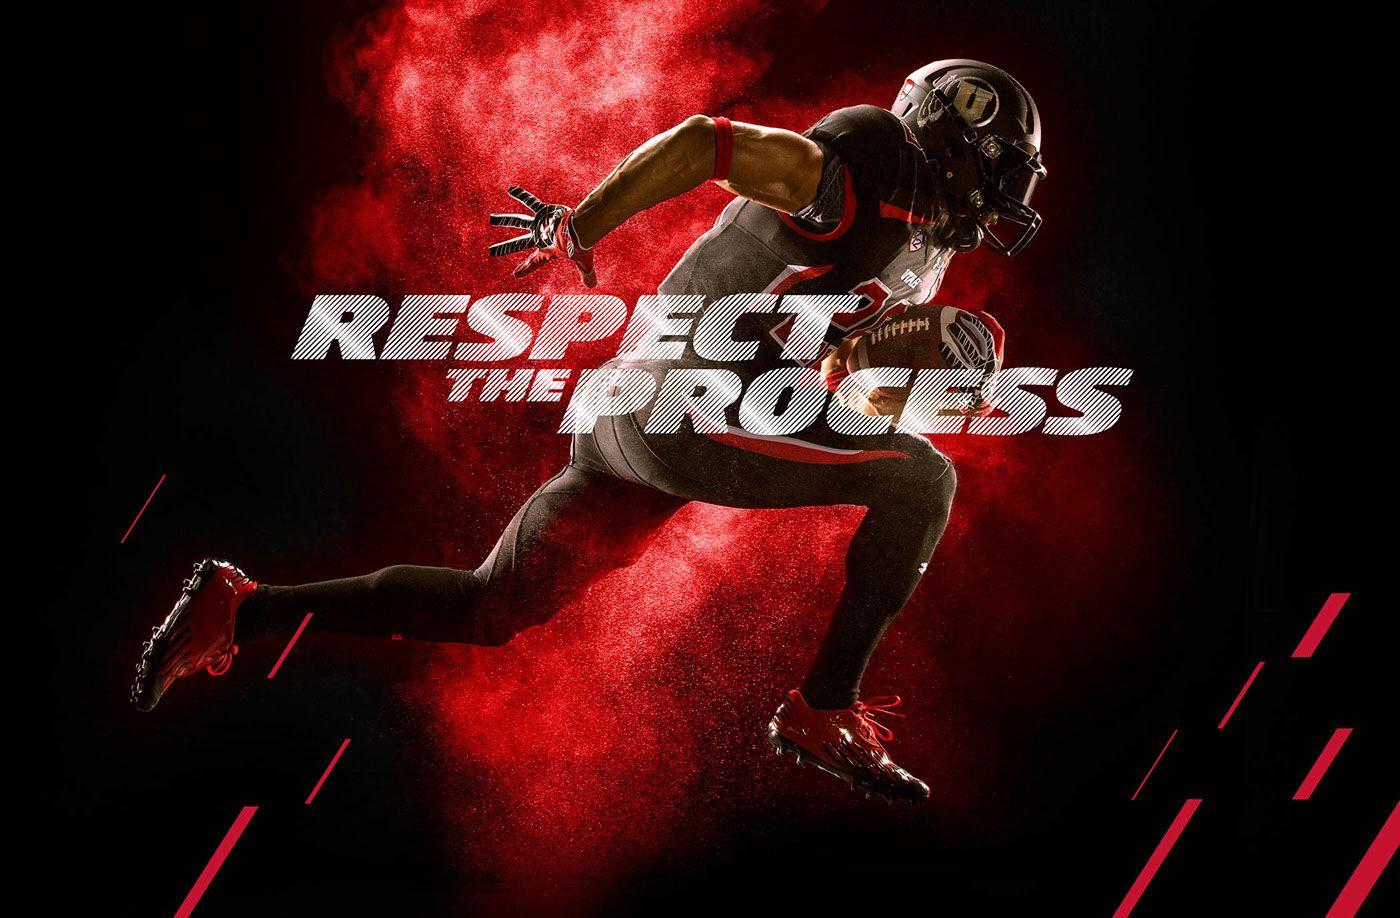 University of Utah Football | Hall of Fame Photography on Behance